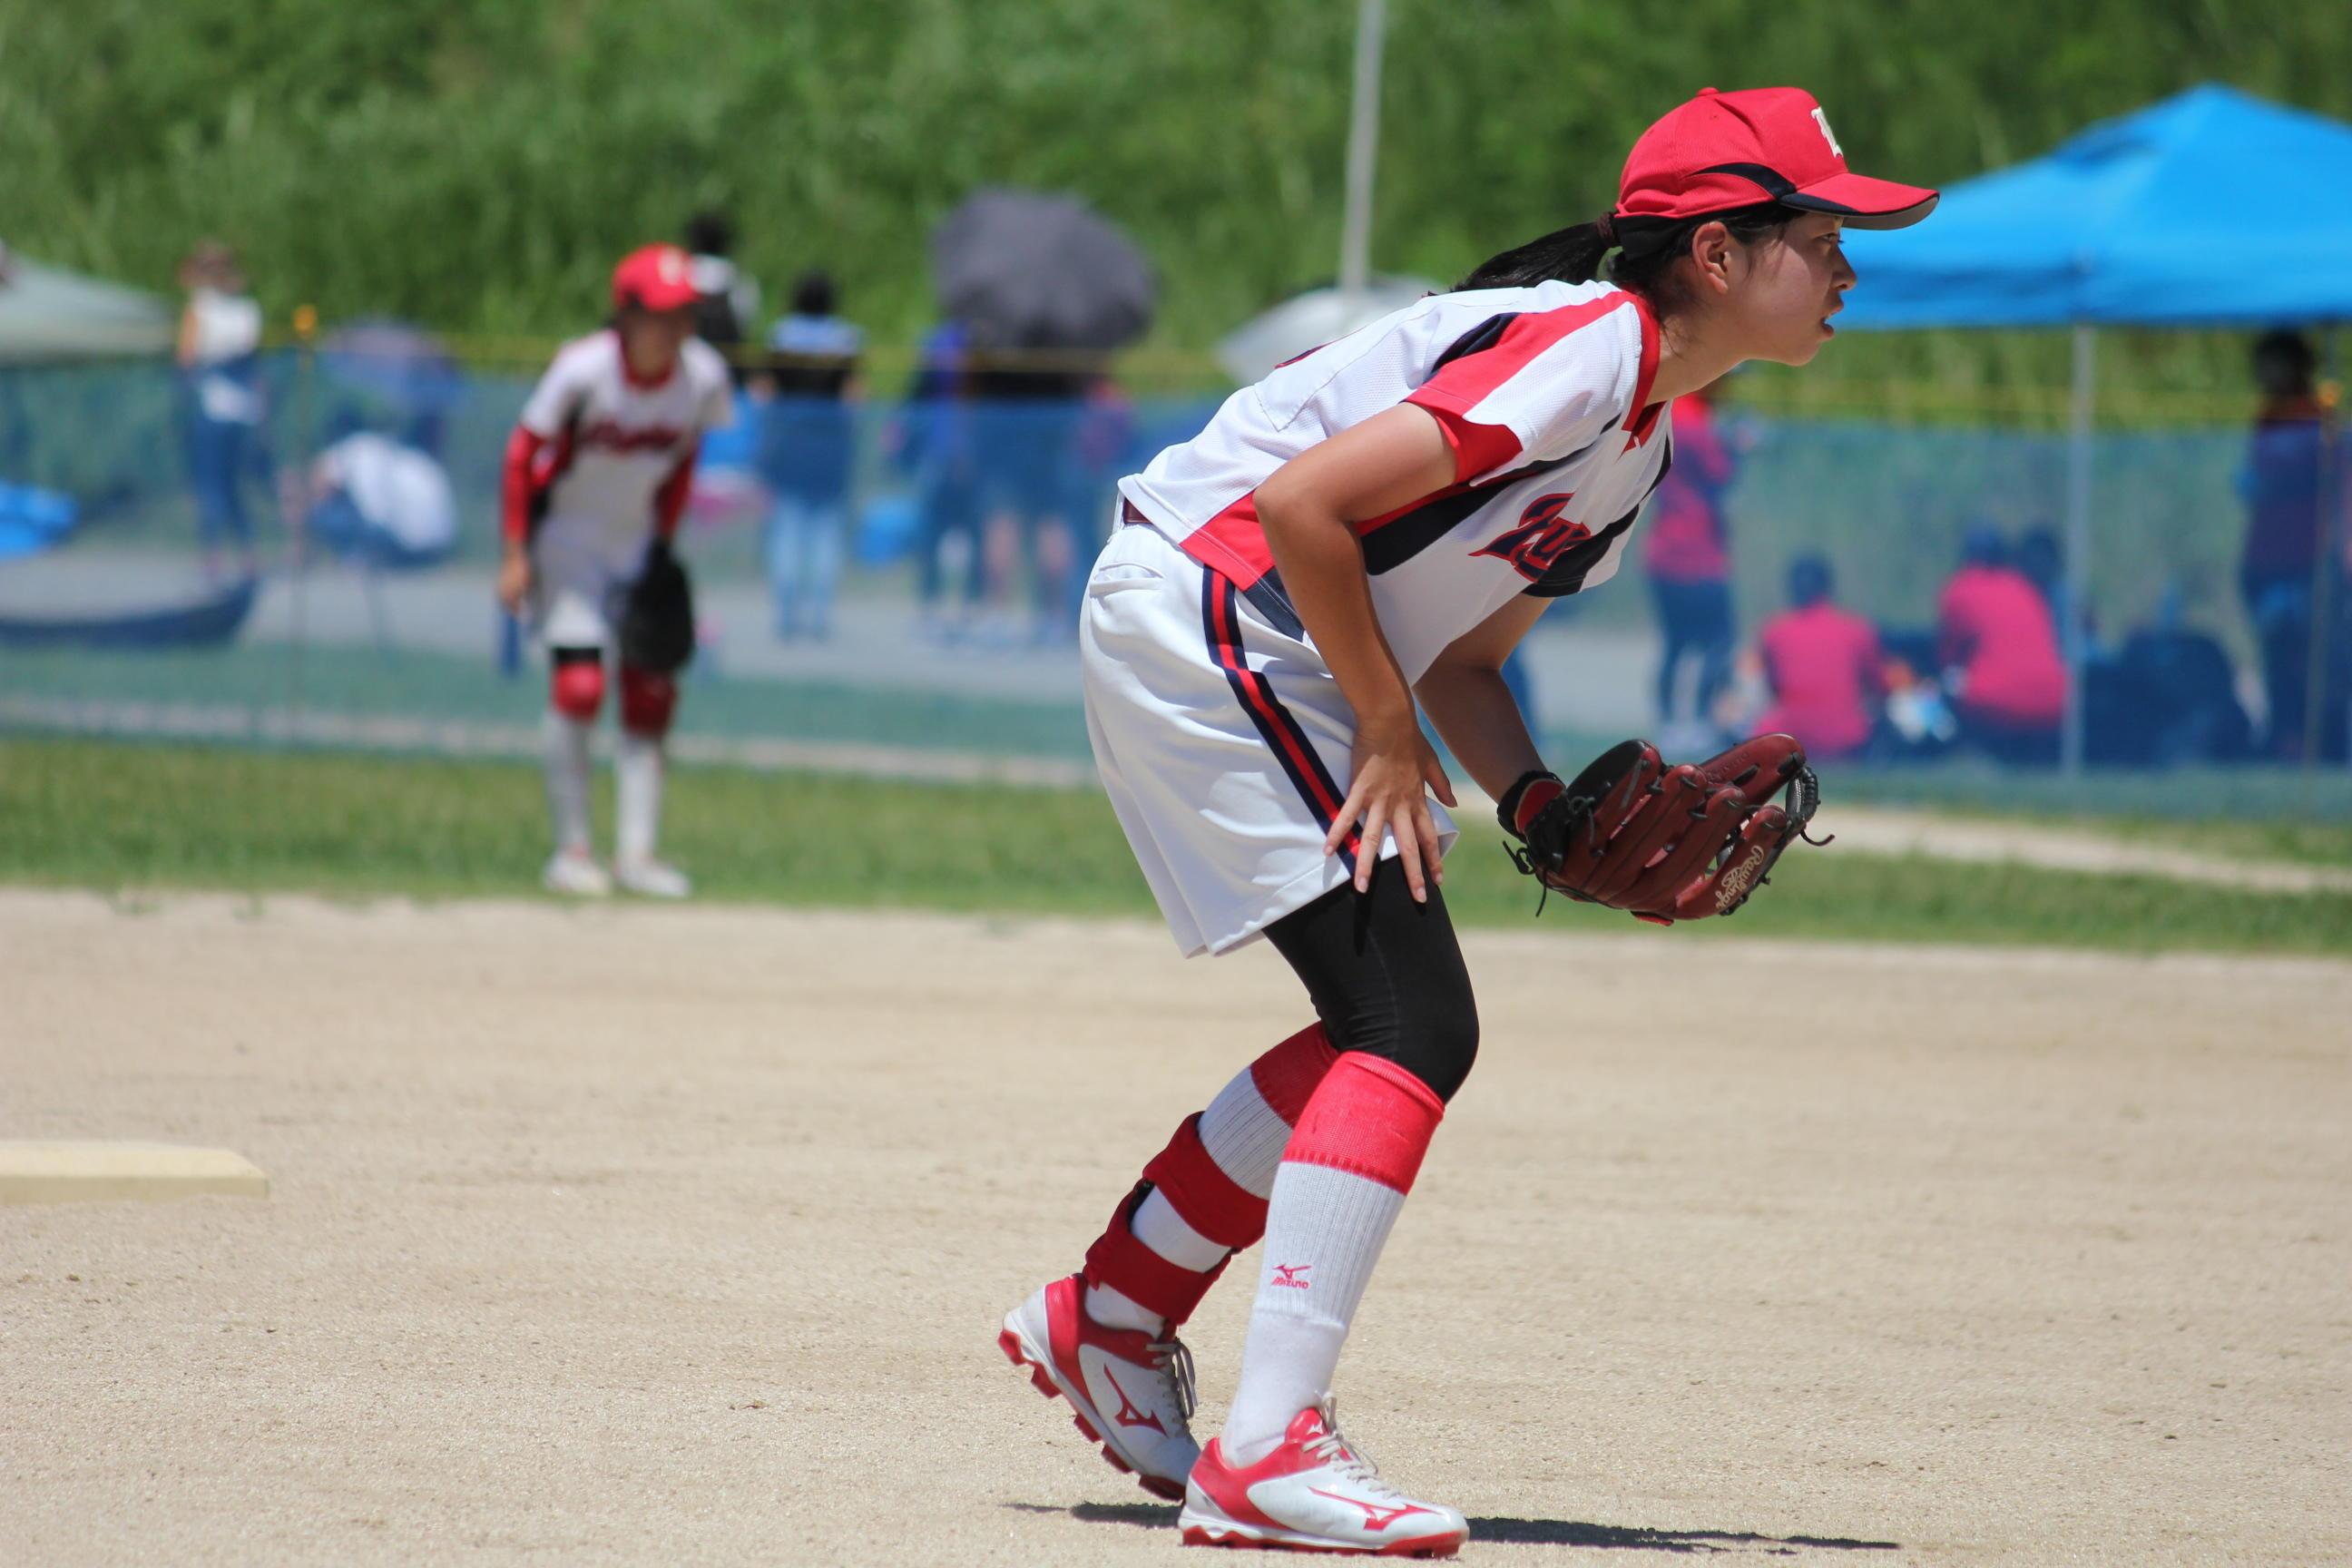 softball20200905-6.JPG